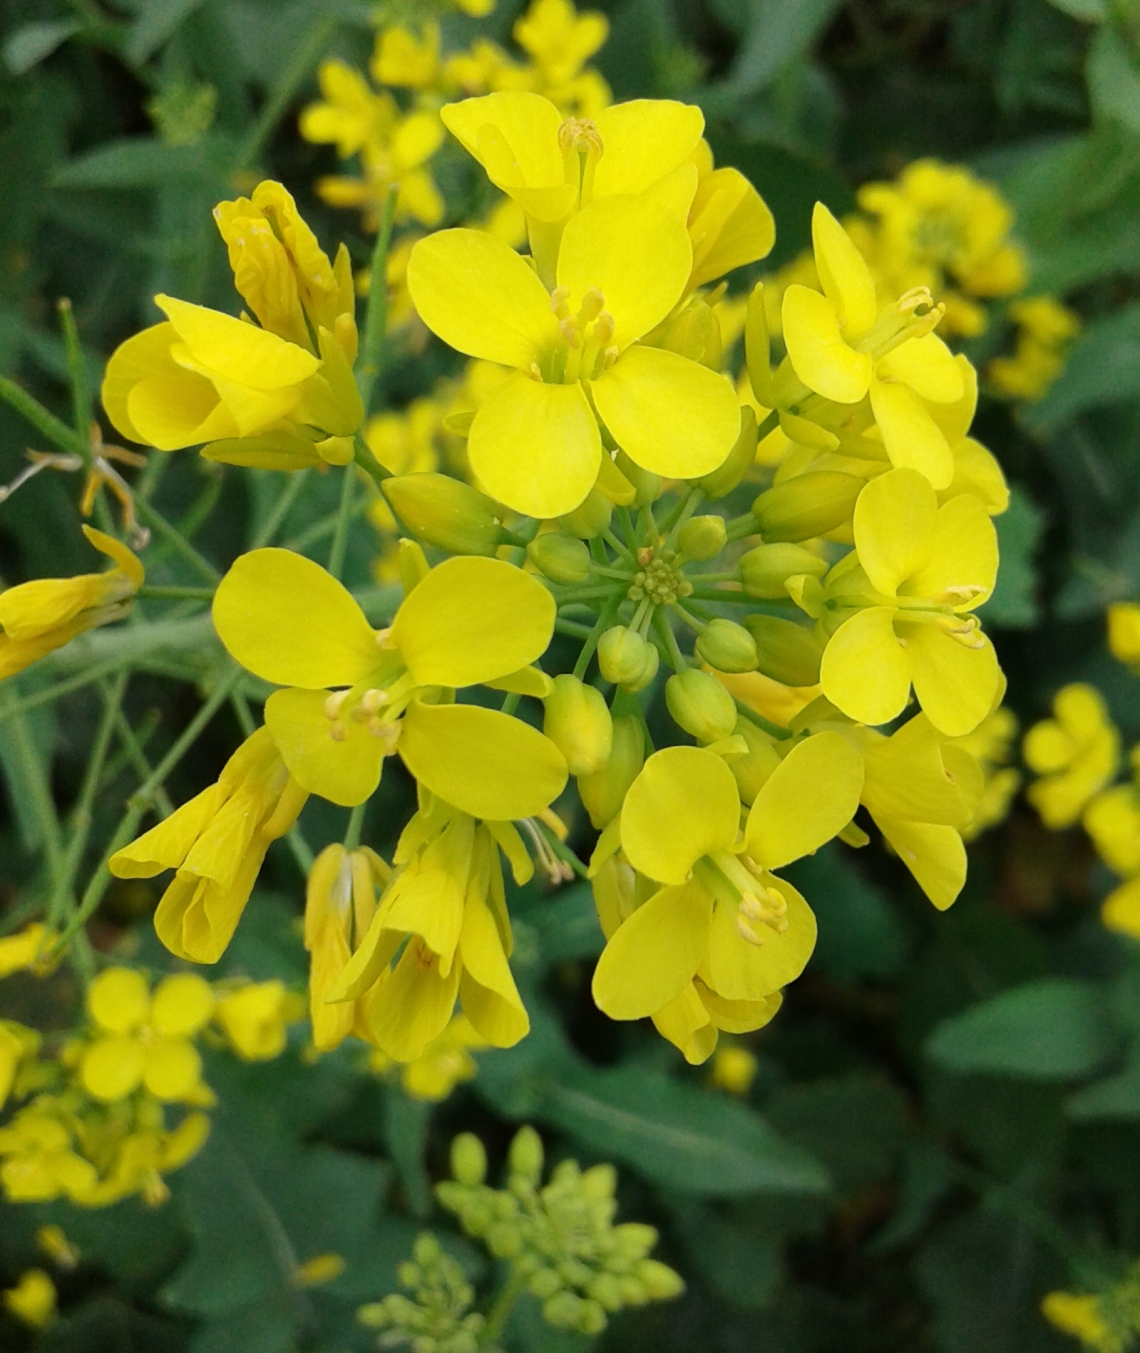 flower-mustard-mustard-plant-rapeseed-yellow-plant-1457293-pxhere.com_.jpg